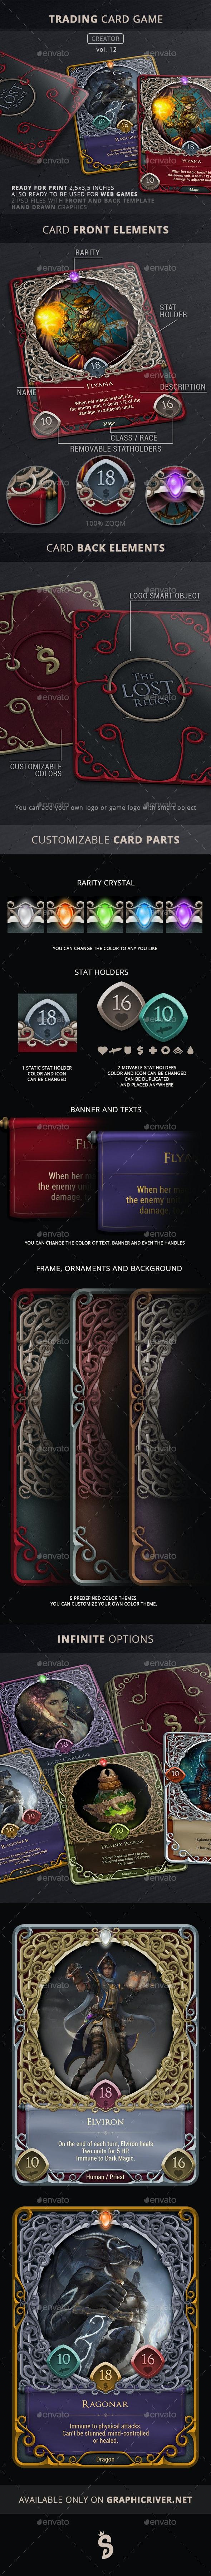 Trading Card Game Creator - Vol 12